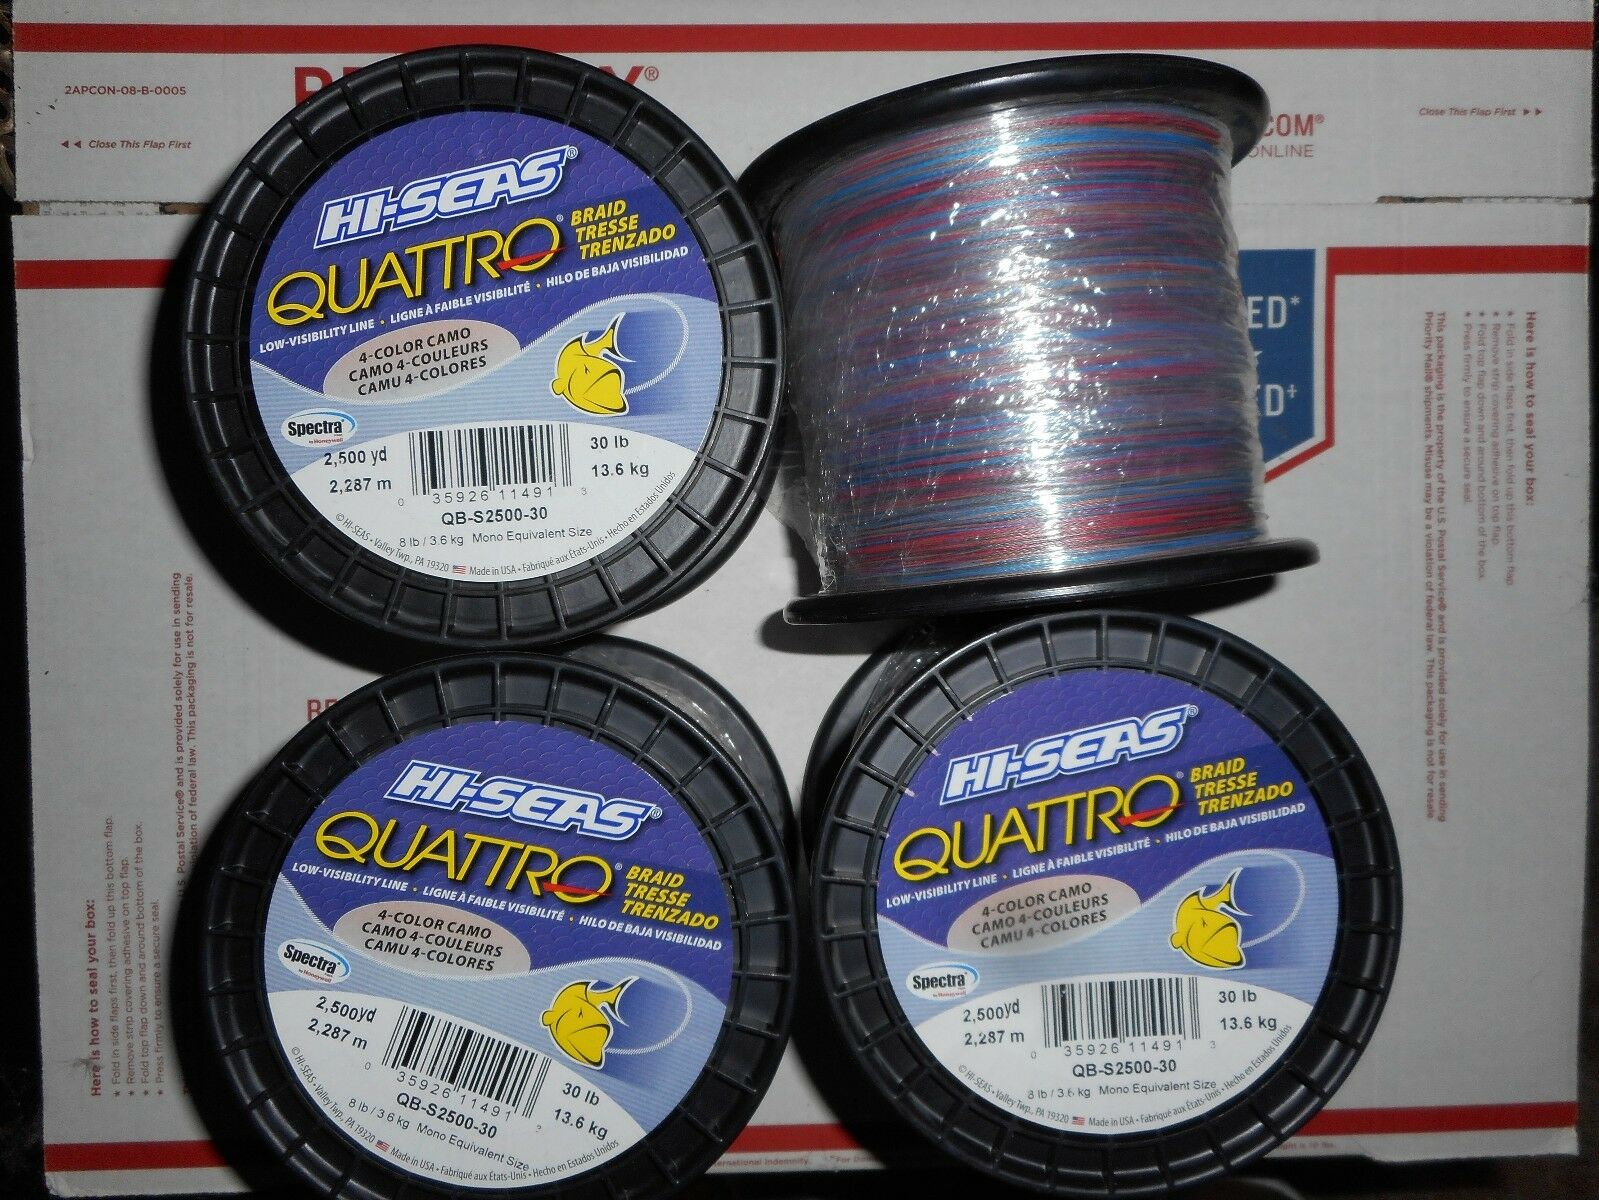 HI-SEAS QUATTRO  Braid Fishing Line Camo 2500 Yards, 30 Pounds  online shop